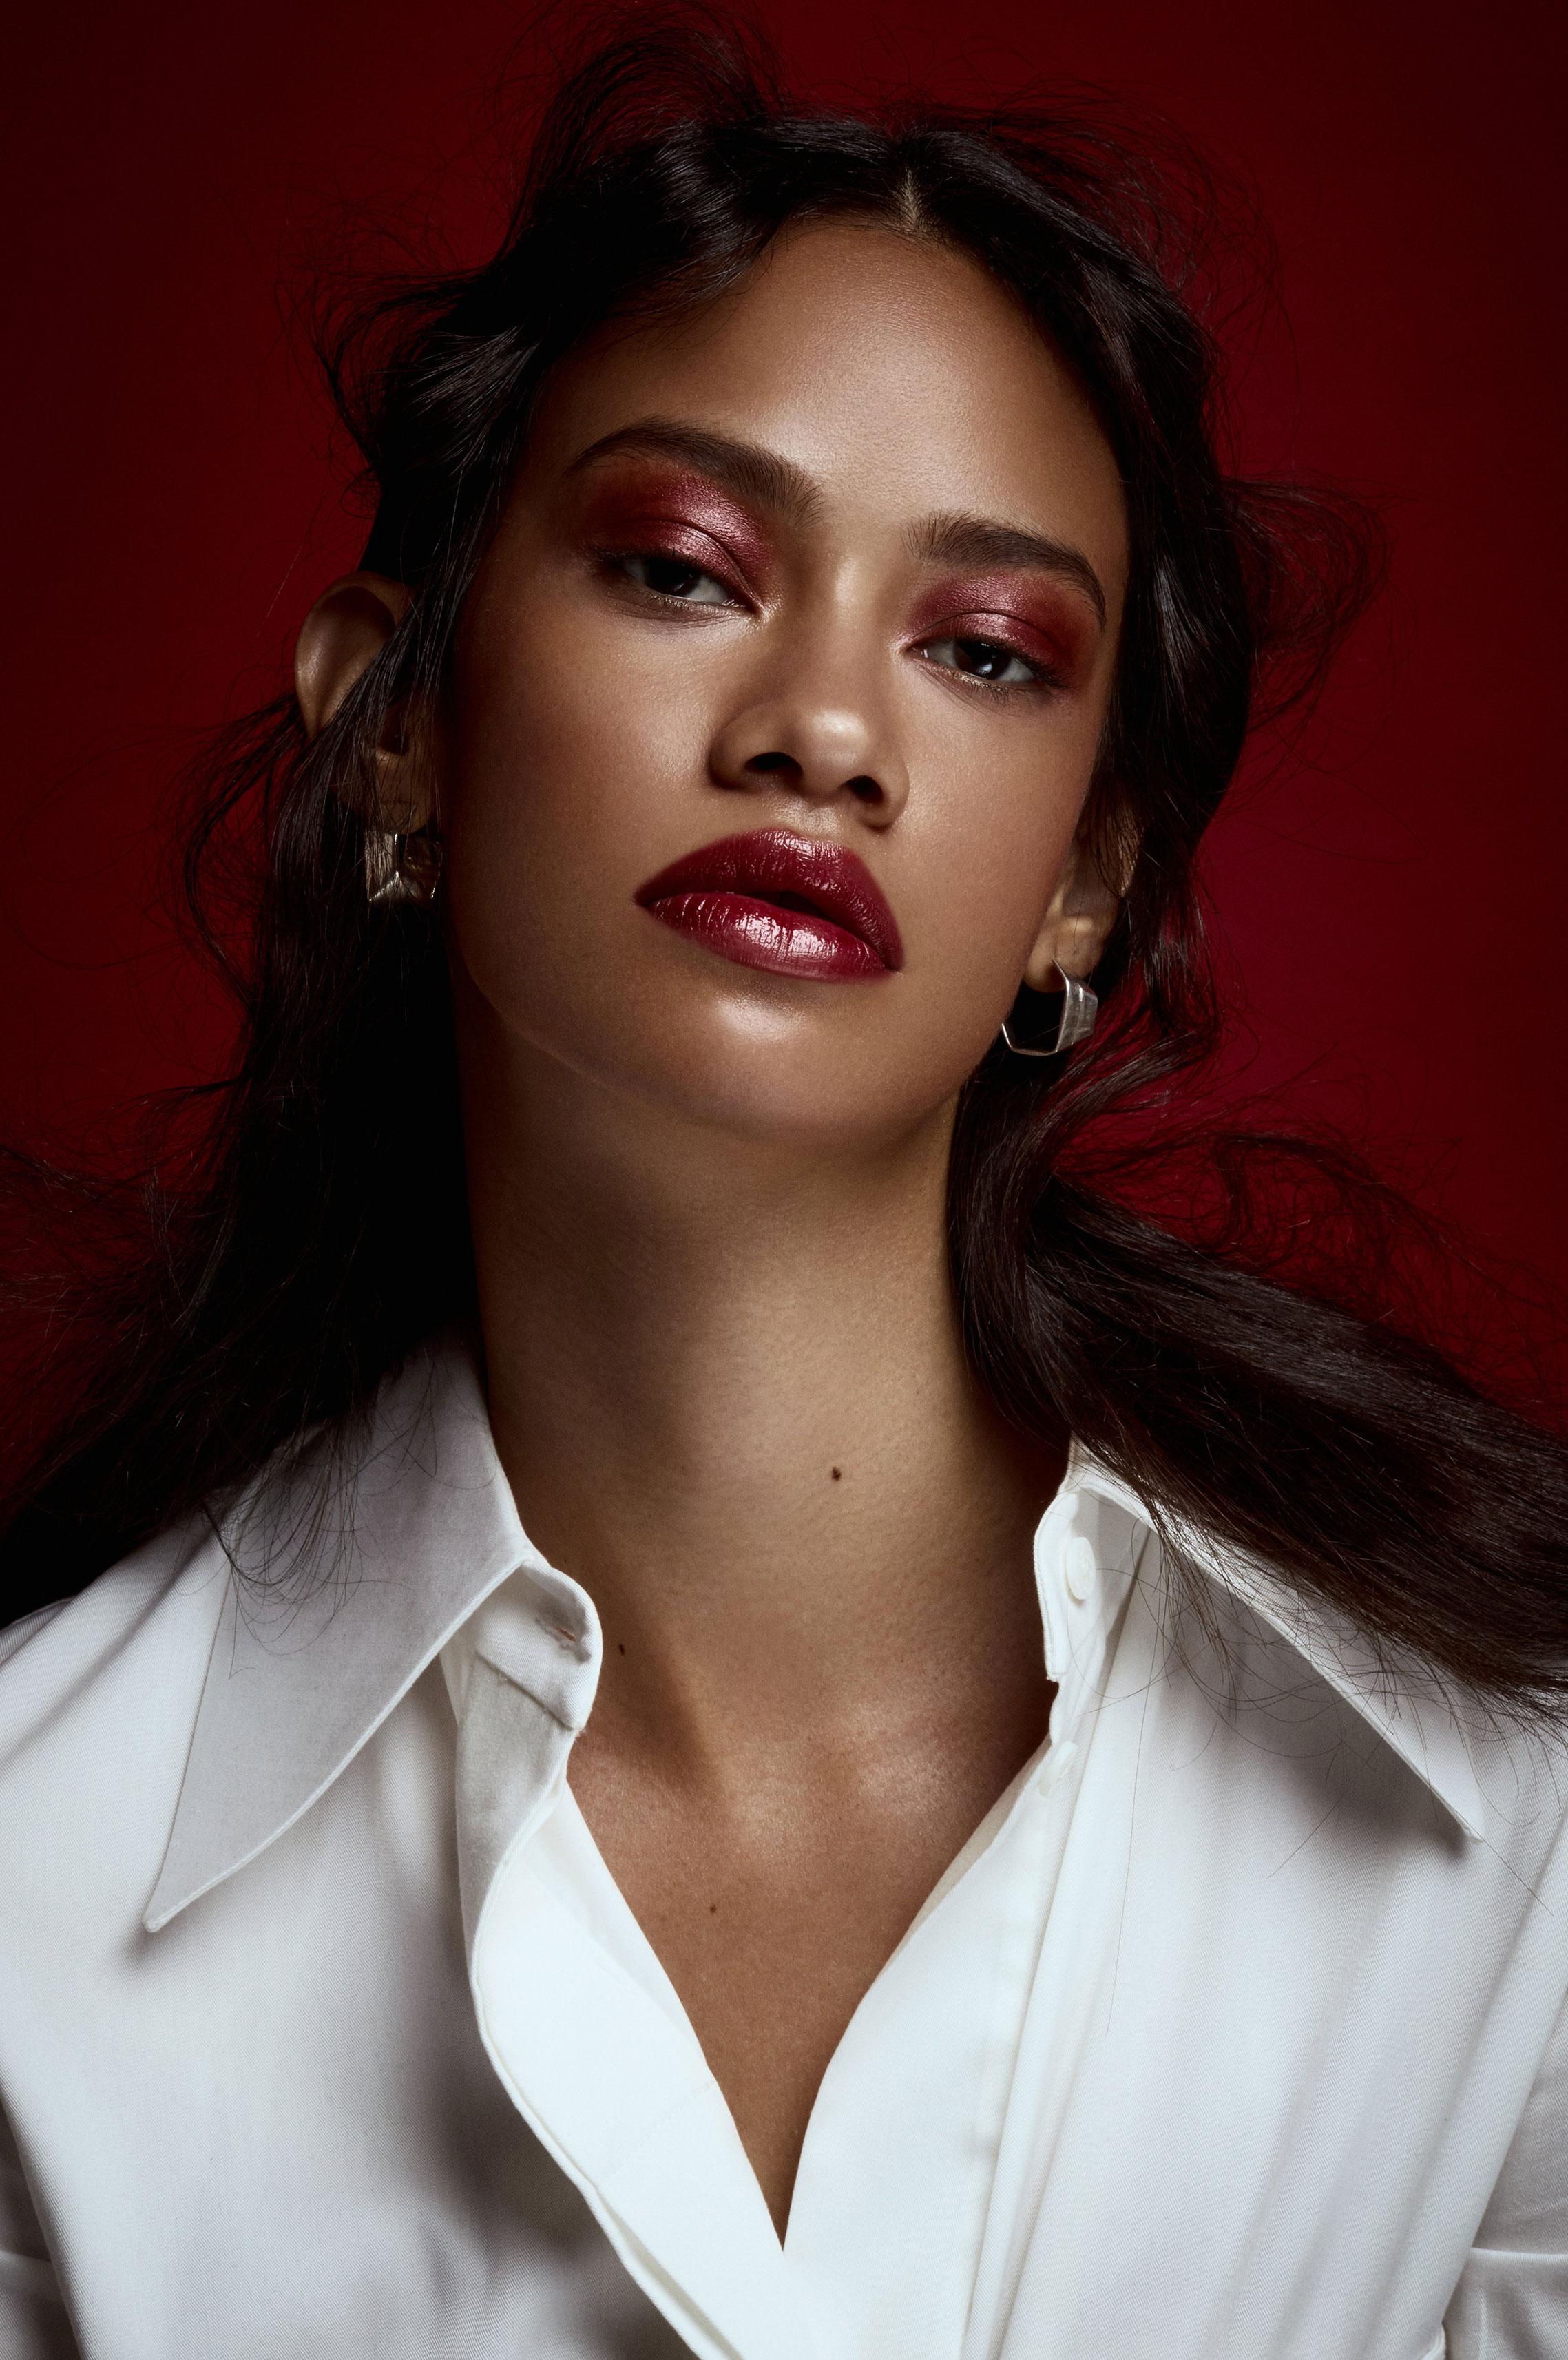 Таис Мартинс - женщина в красном / фото 02